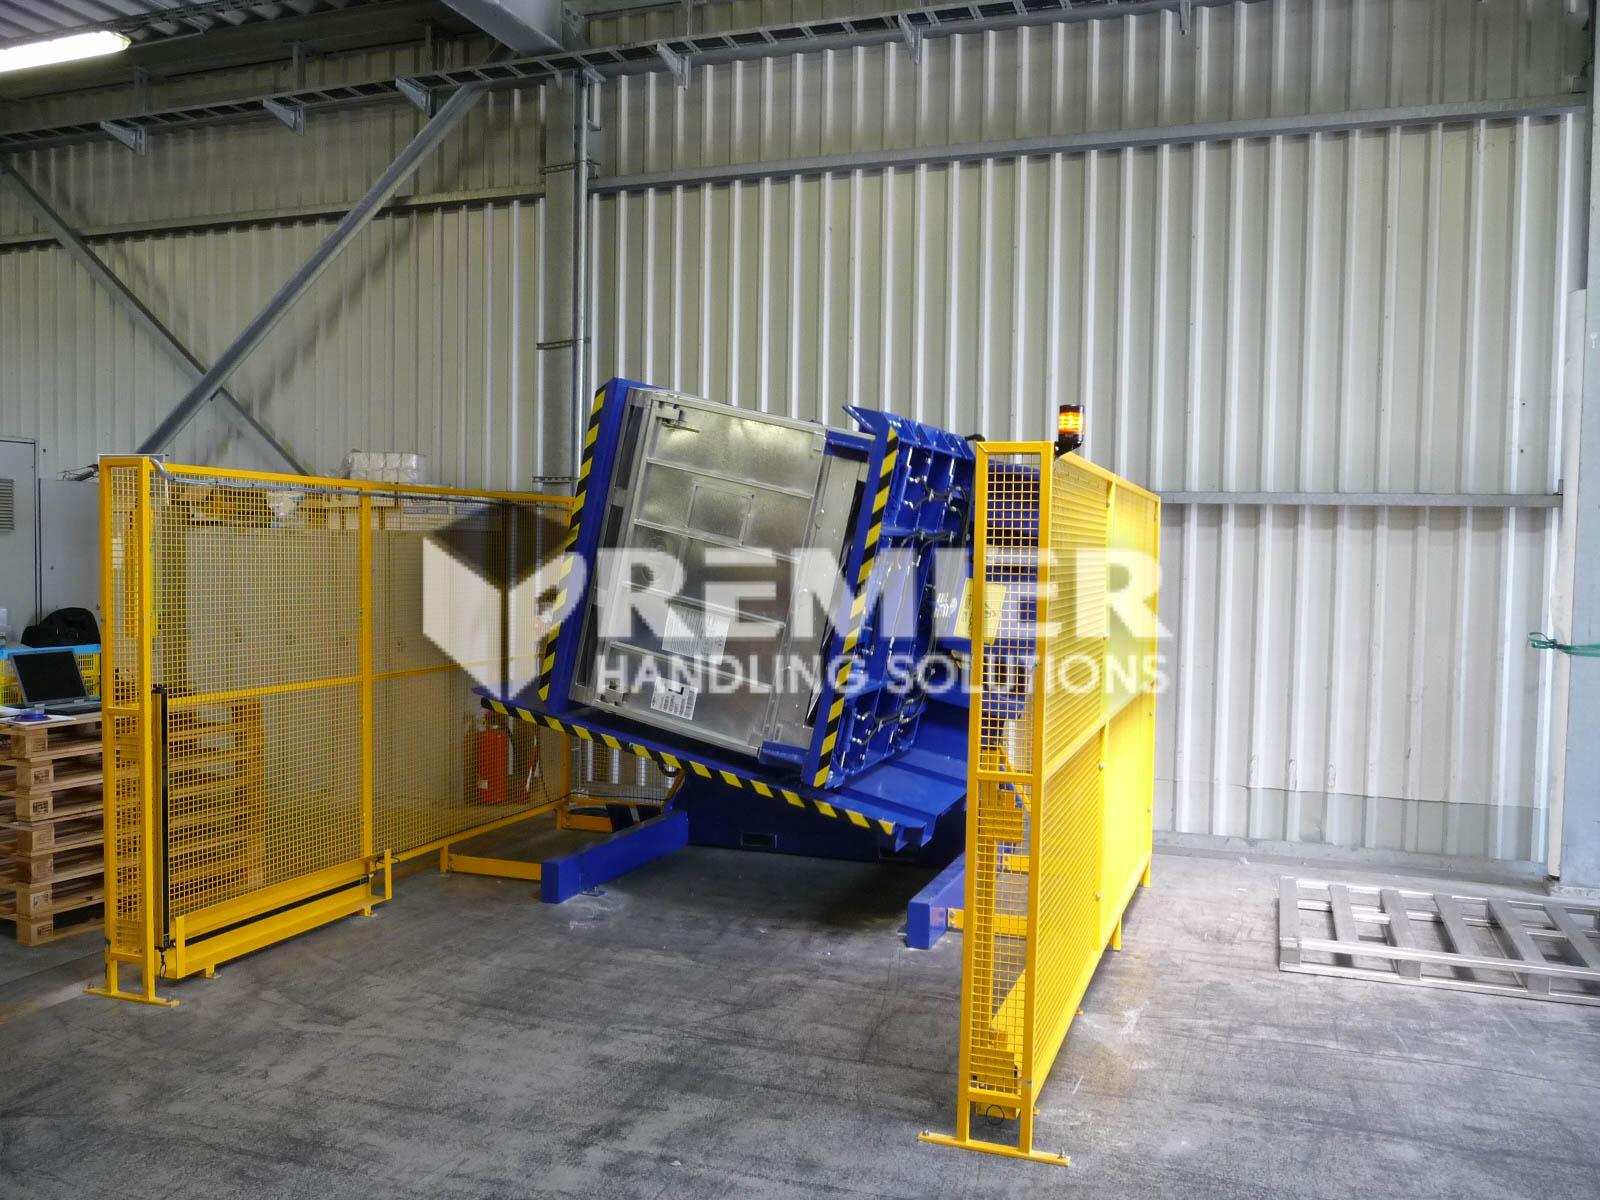 Fsdc Pallet Inverter Gallery 2